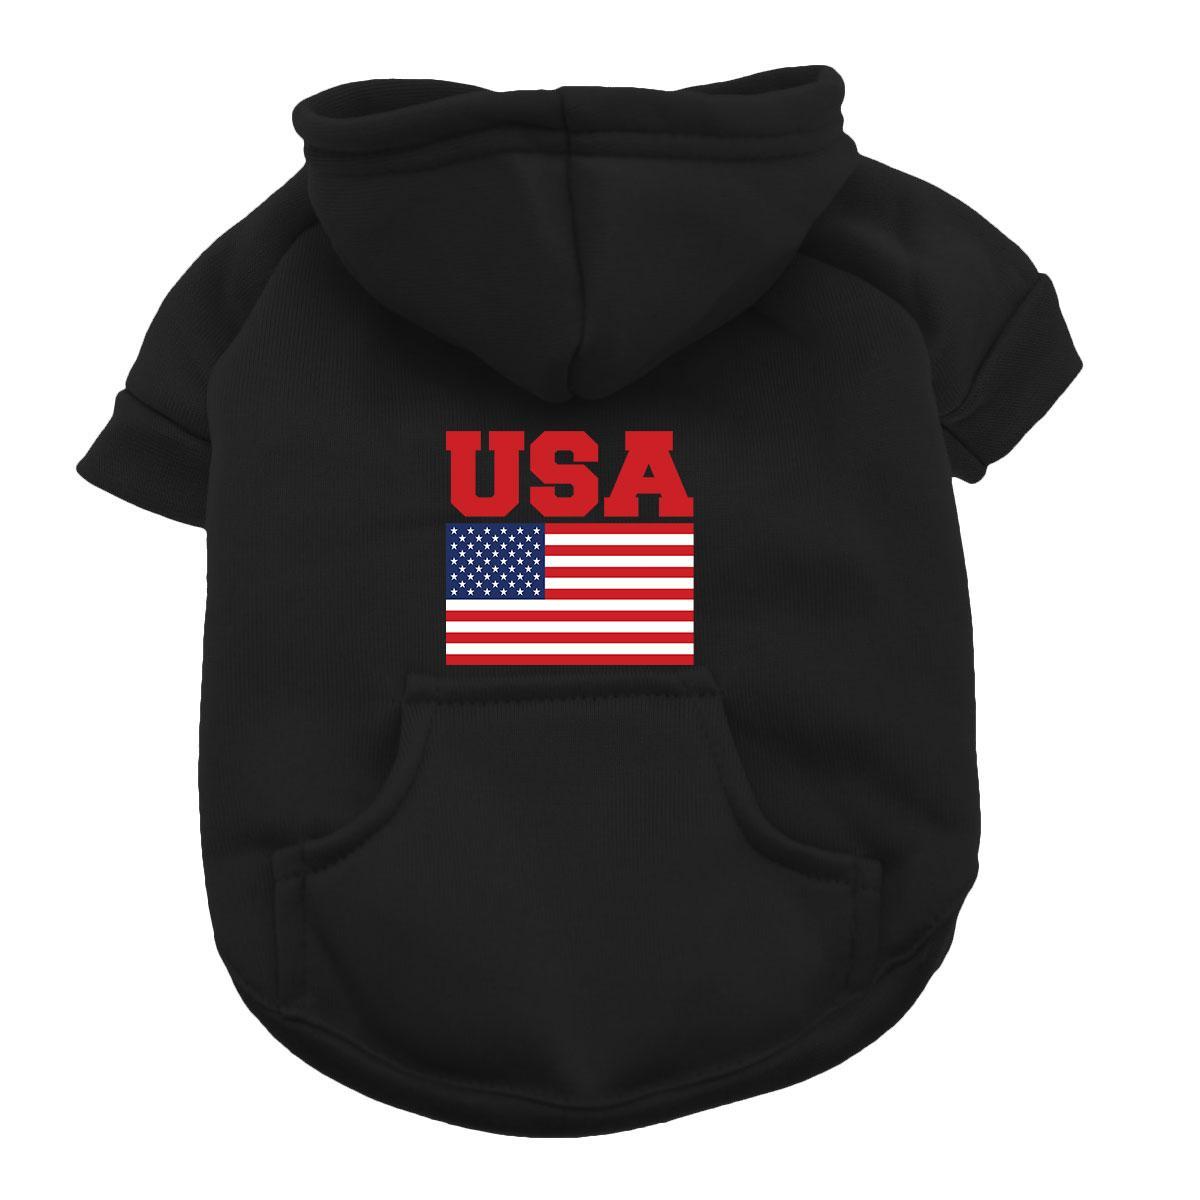 USA Dog Hoodie - Black